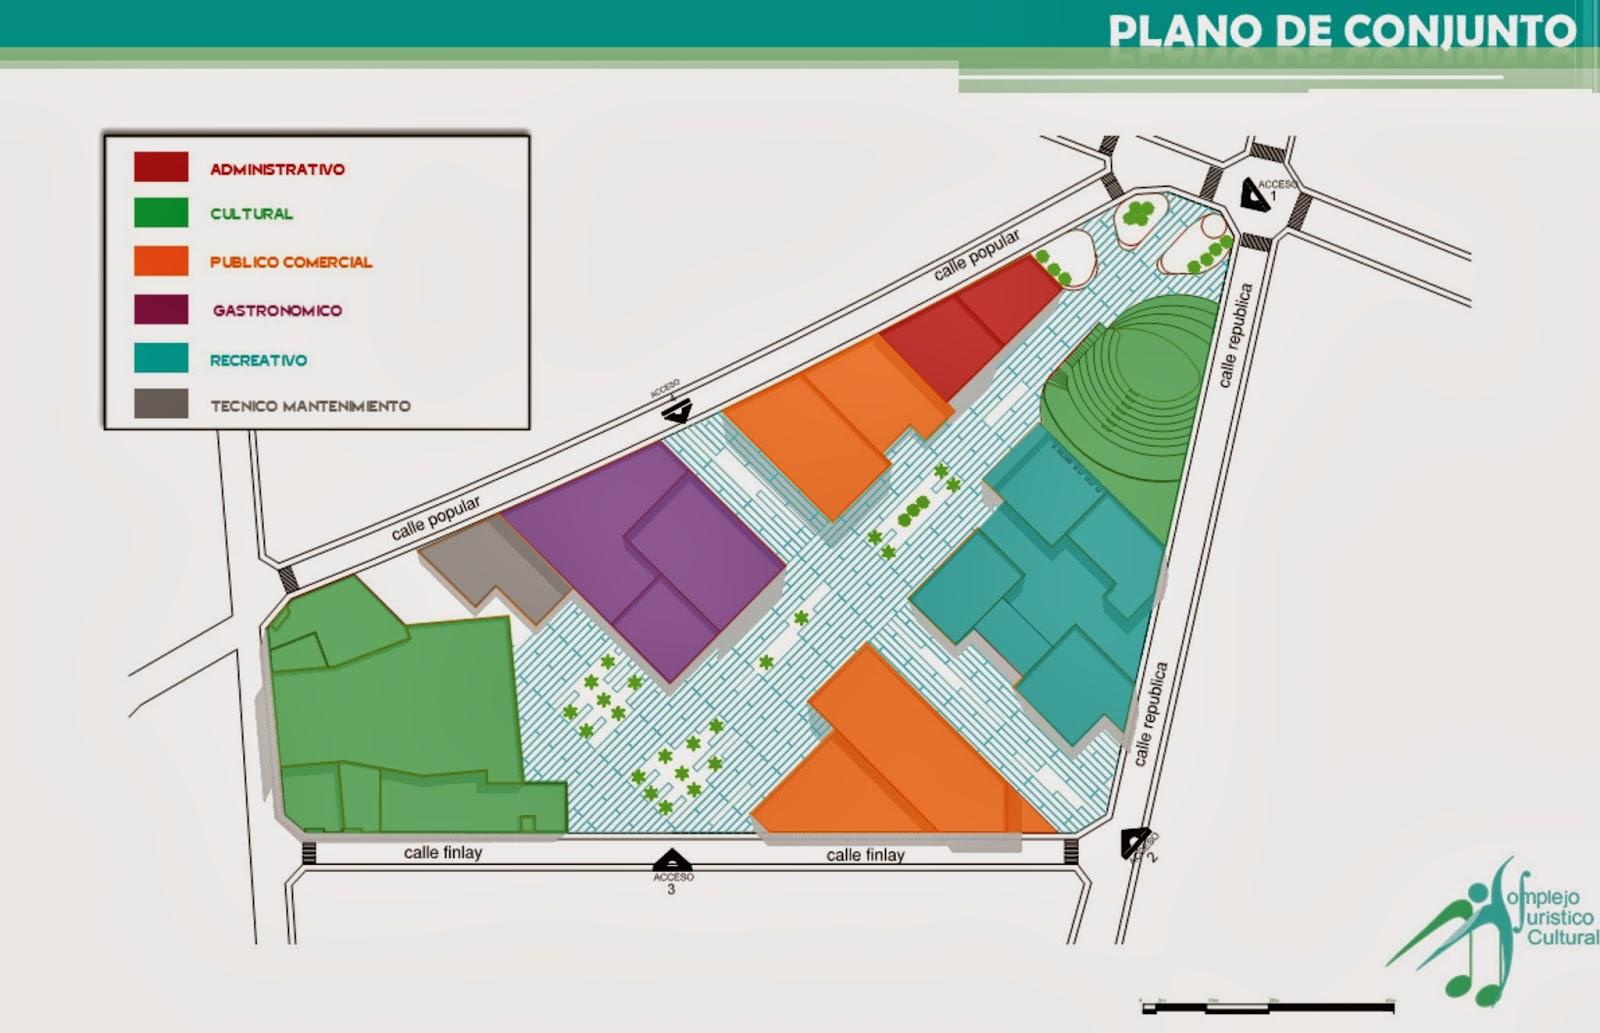 Complejo tur stico cultural proyecto arquitectonico for Pie de plano arquitectonico pdf